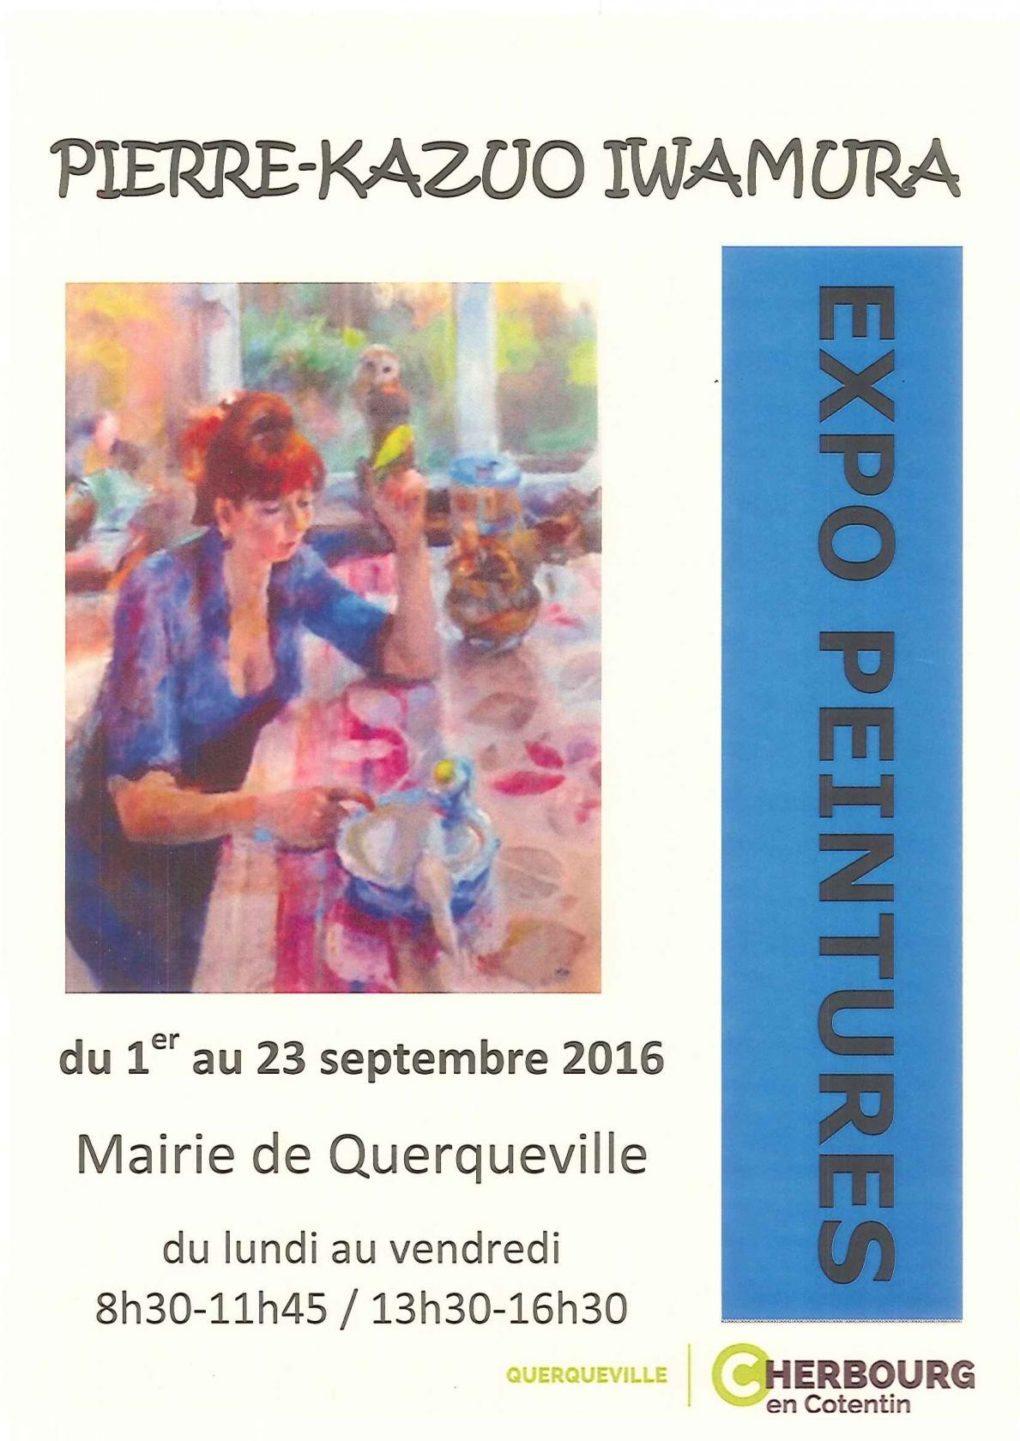 Peinture de Pierre-Kazuo Iwamura Cherbourg-en-Cotentin